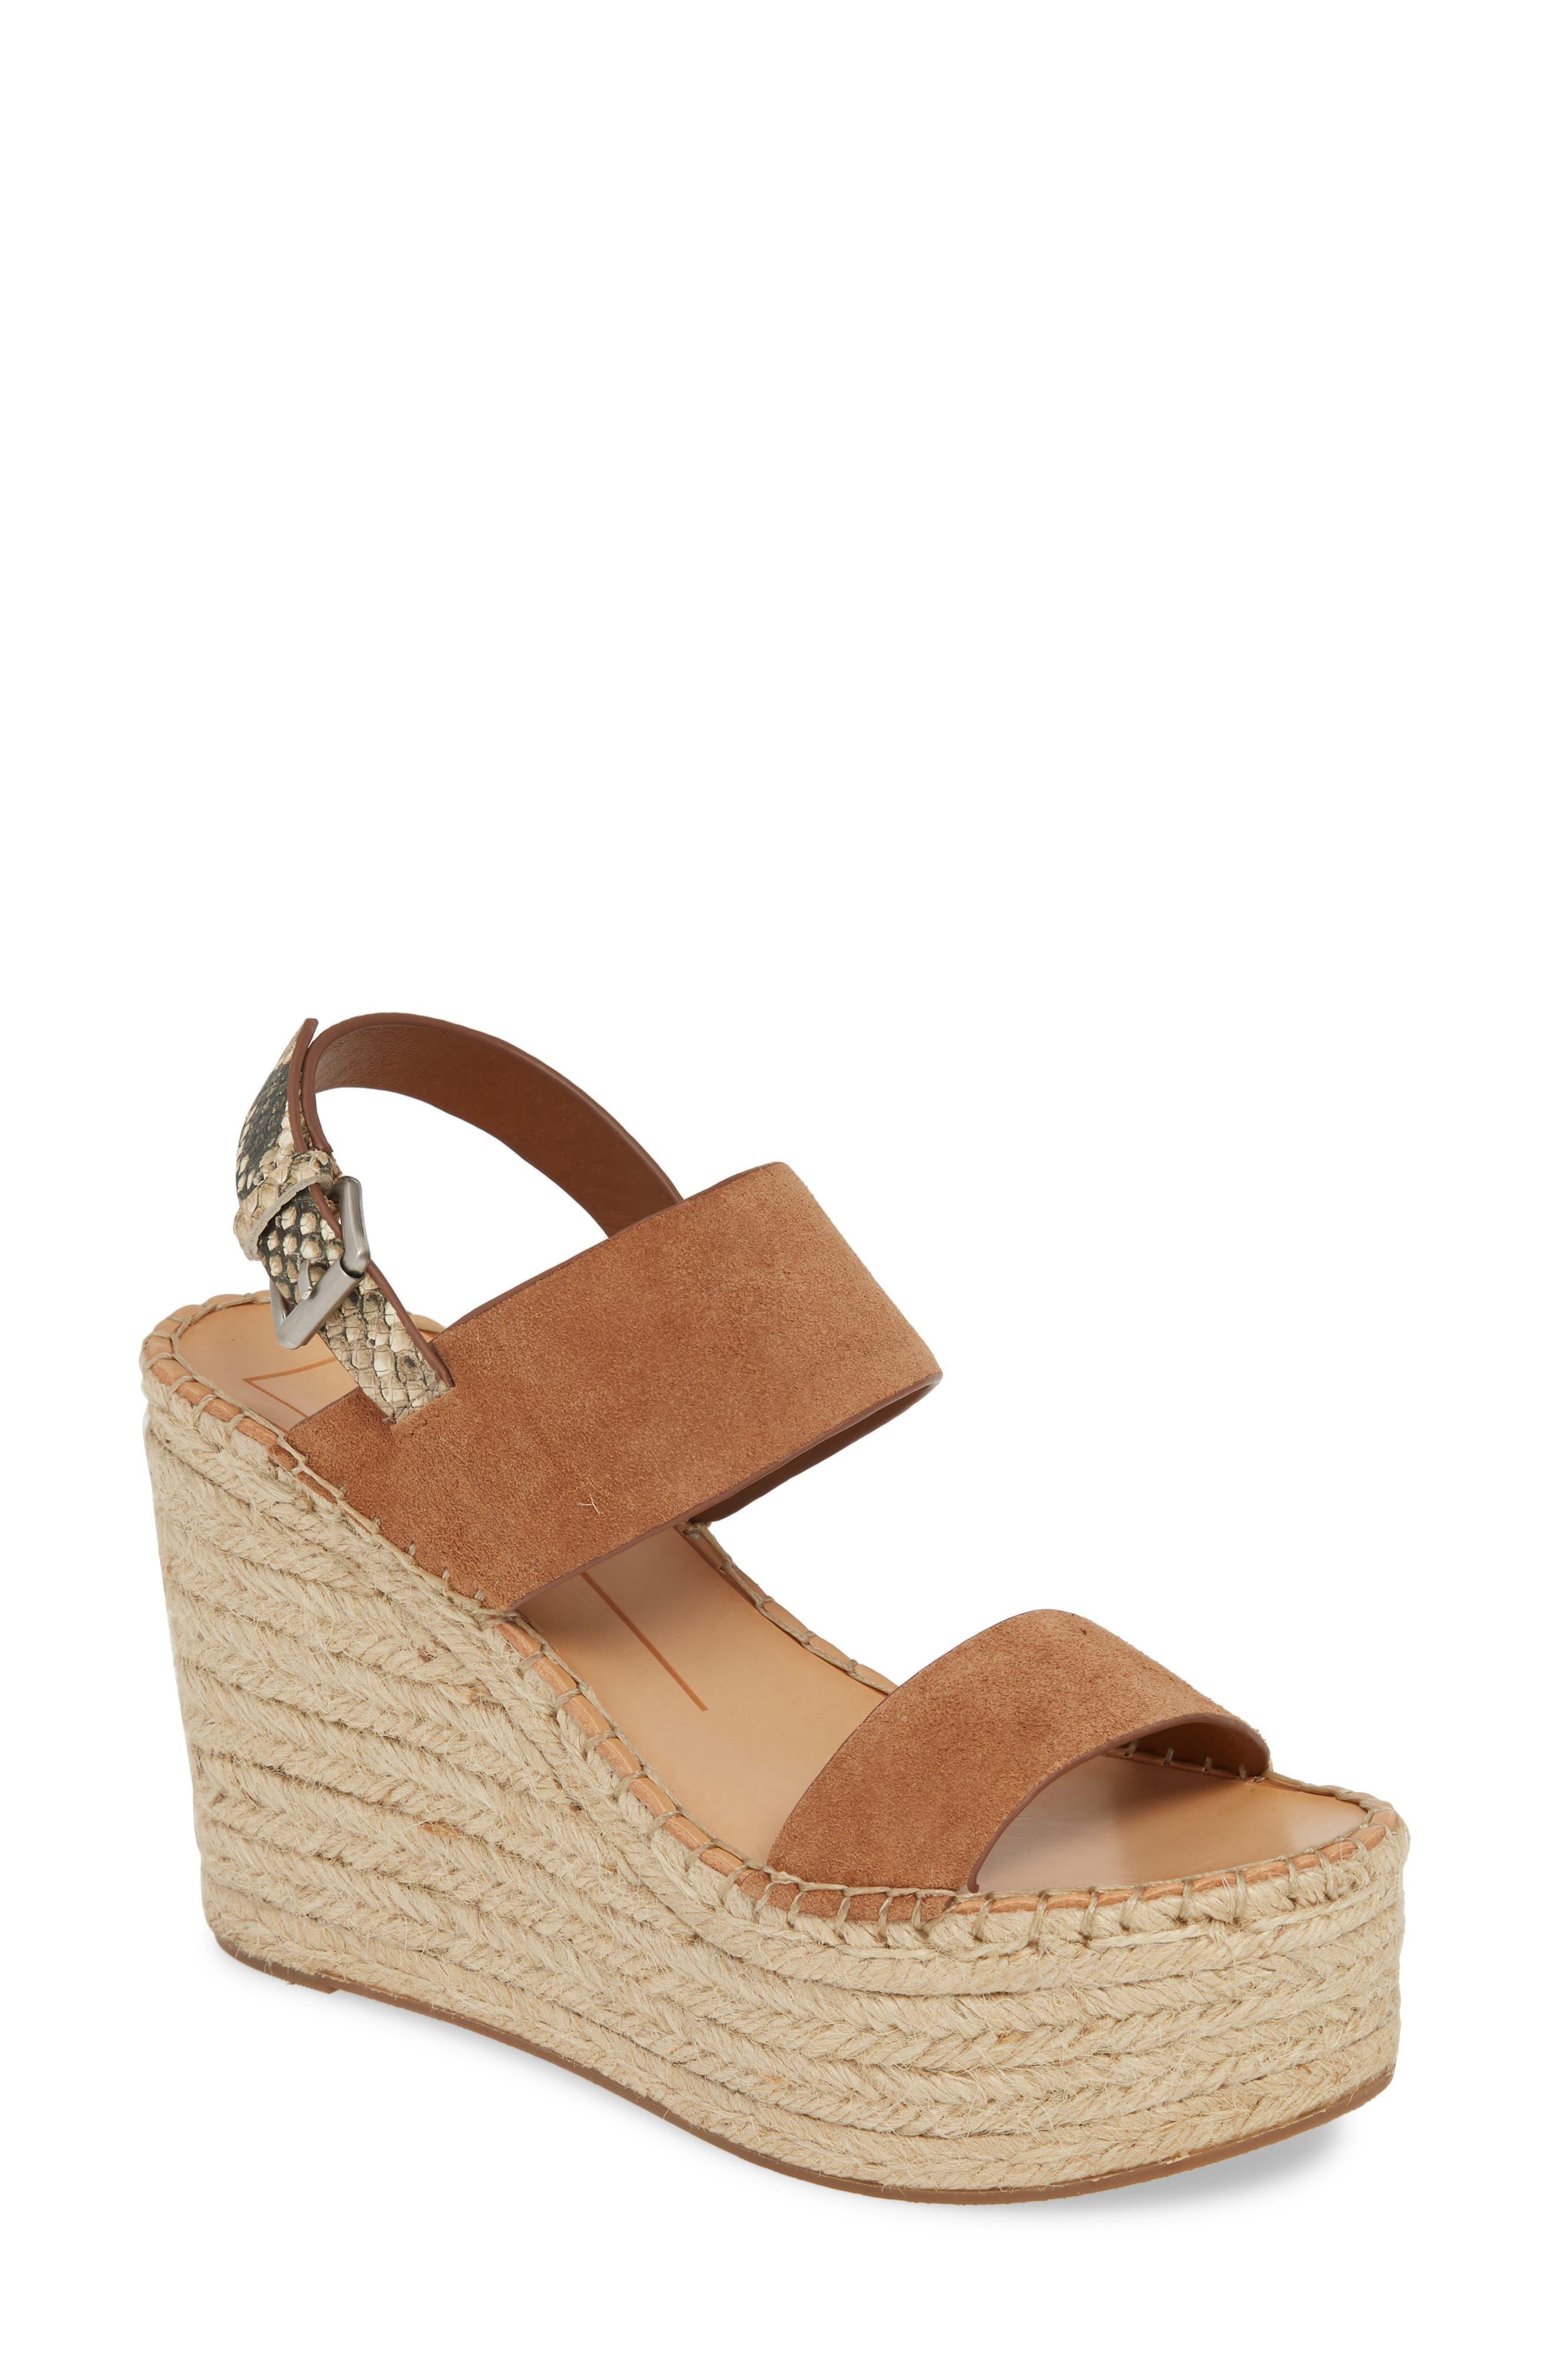 Dolce Vita Spiro Platform Wedge Sandal, Brown